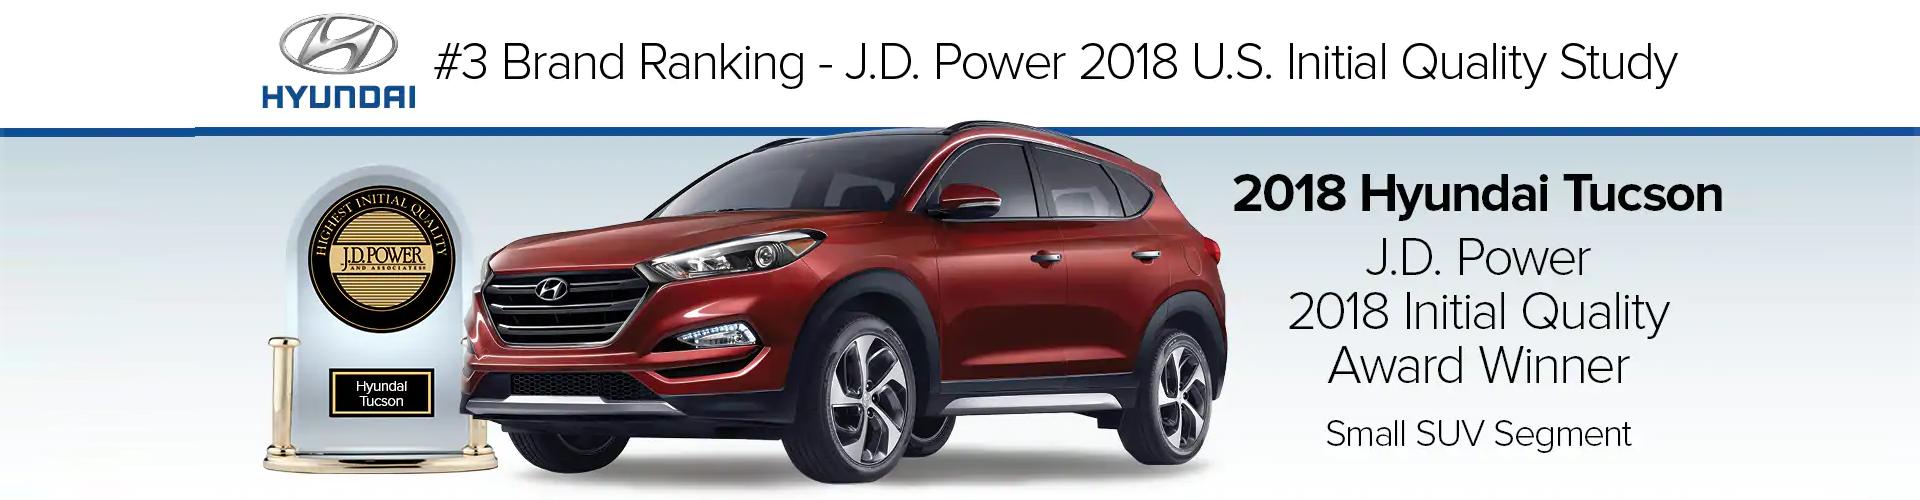 The Taylor Automotive Family 2018 Hyundai Tucson